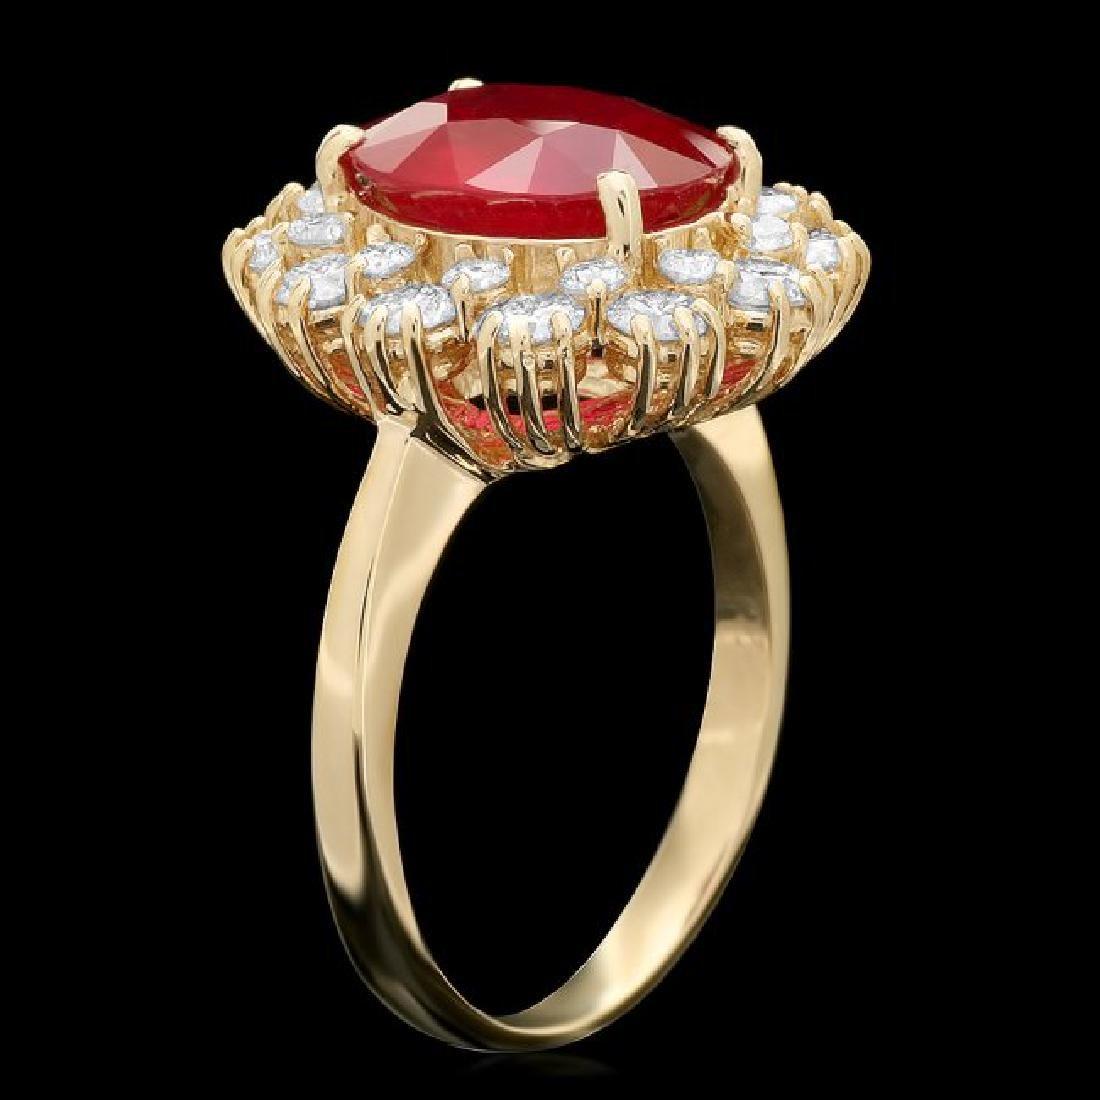 14k Yellow Gold 3.50ct Ruby 1.40ct Diamond Ring - 2